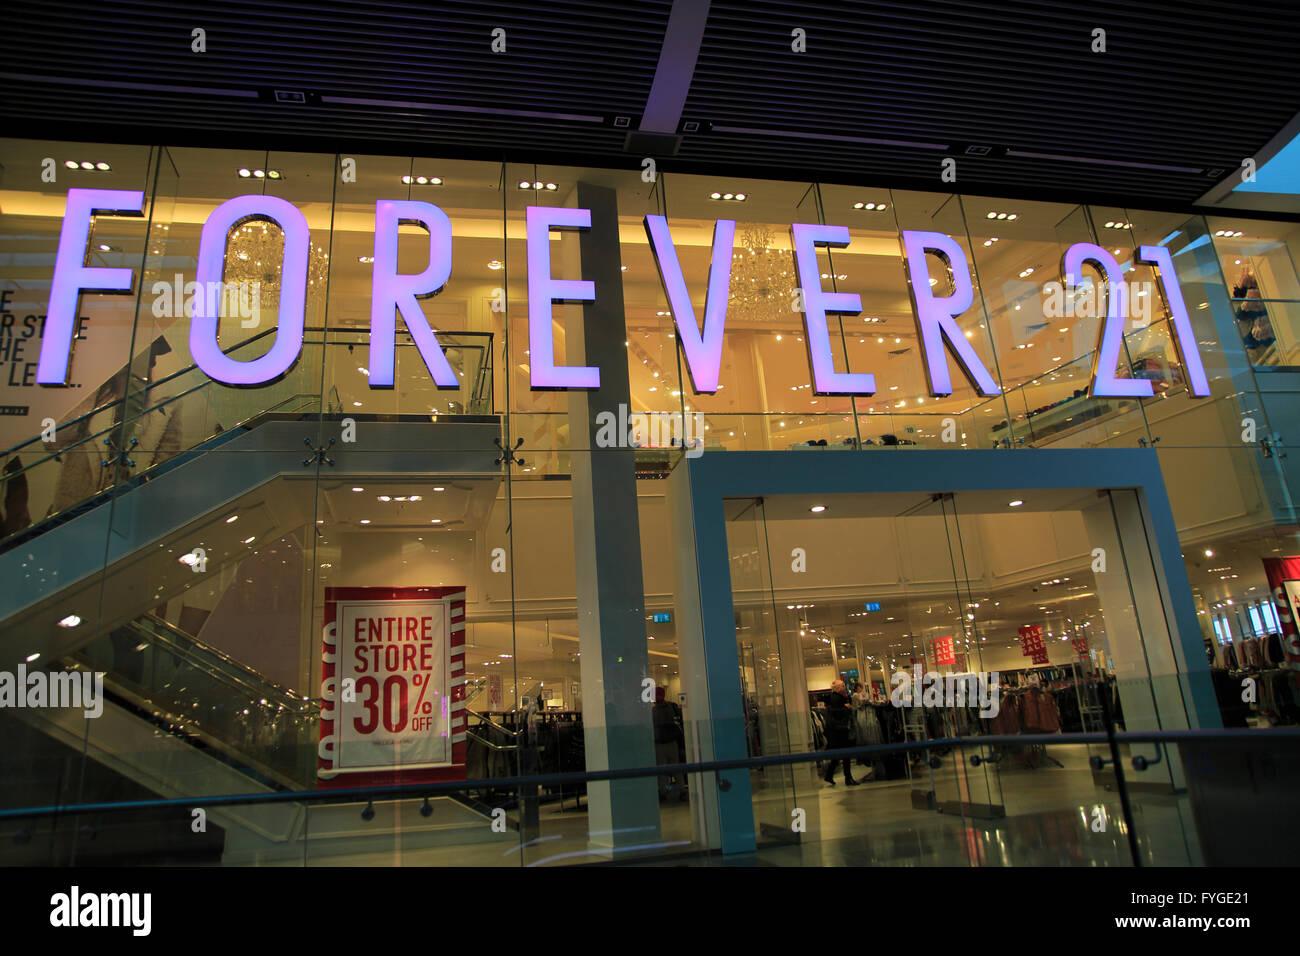 Forever 21 shop inside Westfield shopping centre, Stratford, London, England, UK - Stock Image